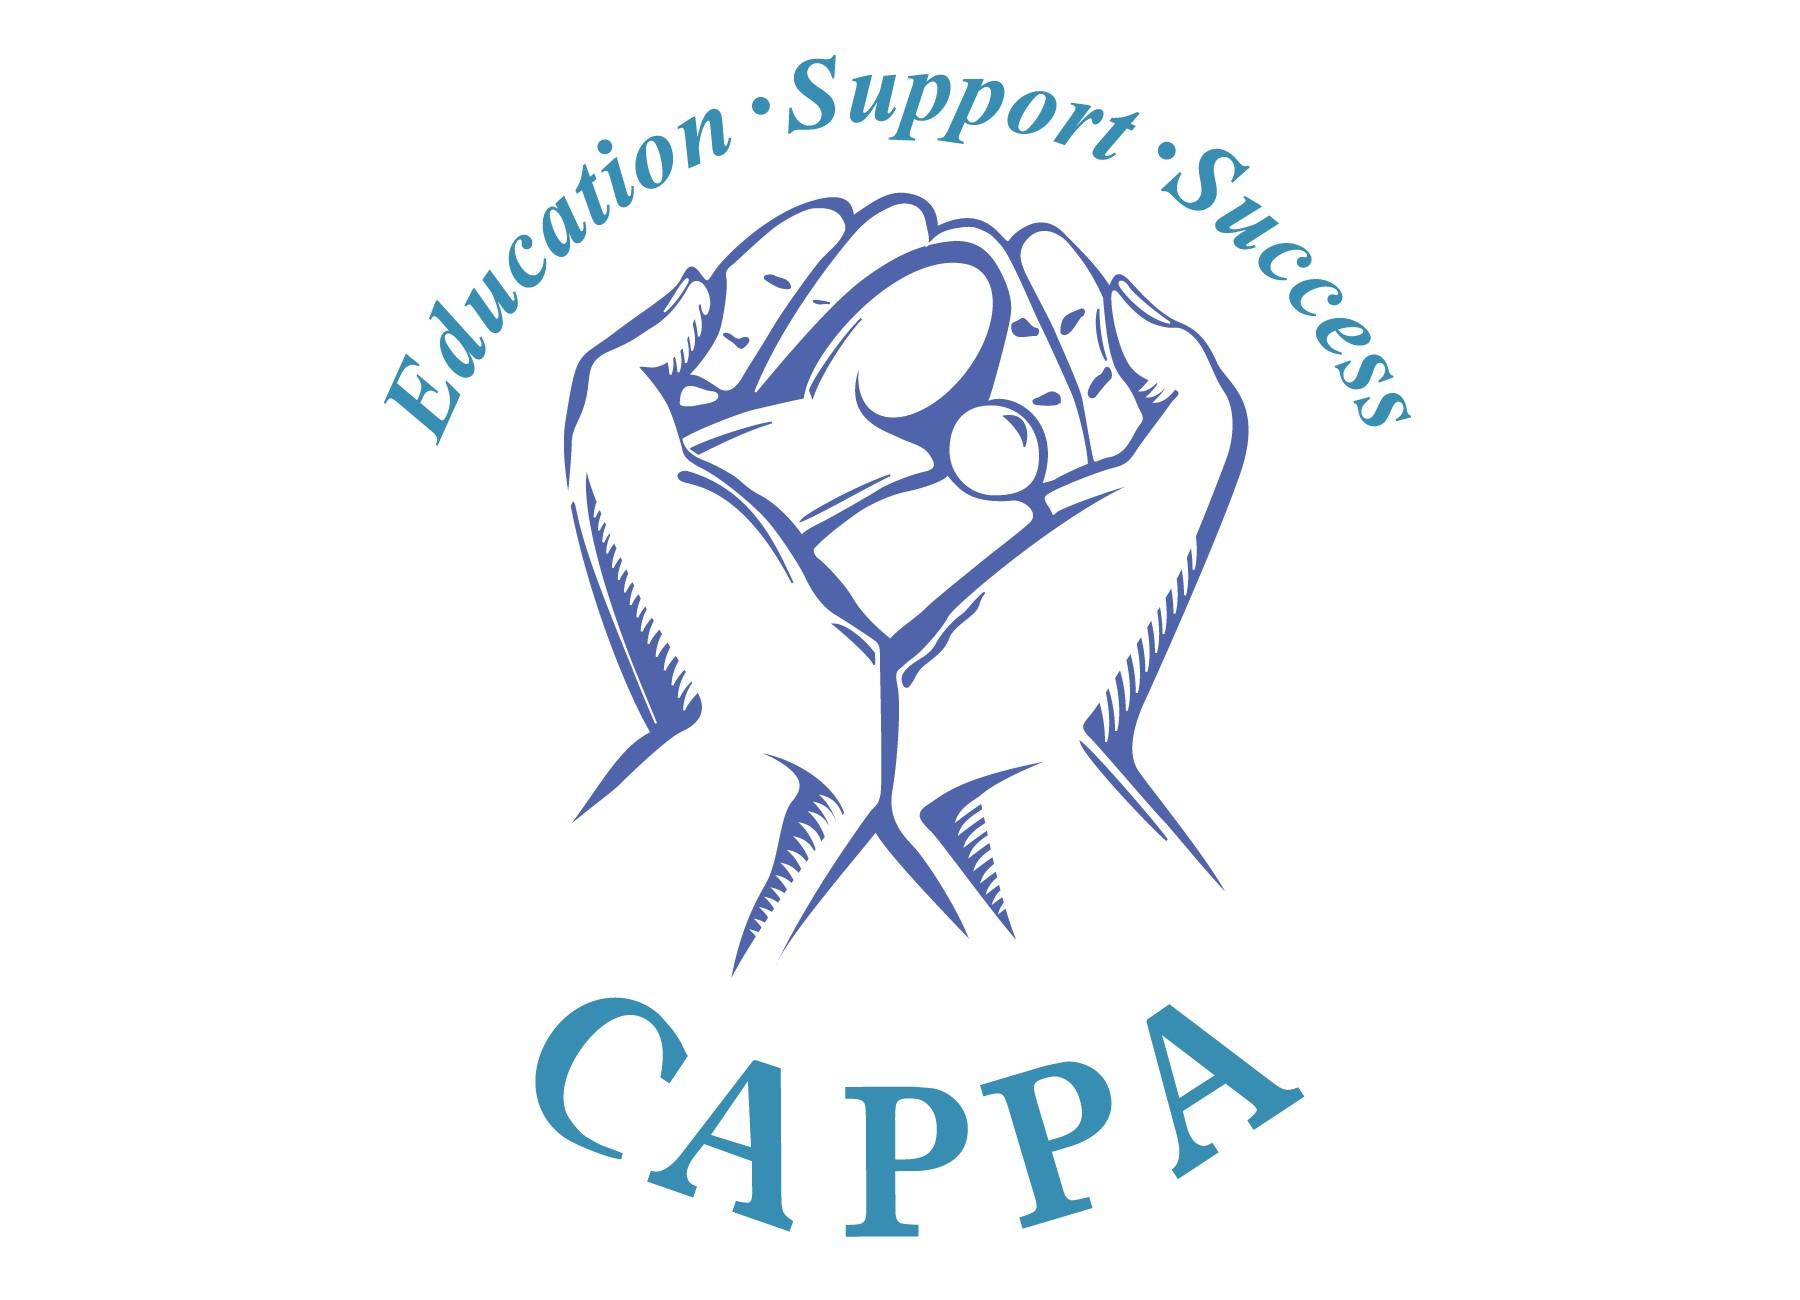 CAPPA (Childbirth and Postpartum Professional Association)